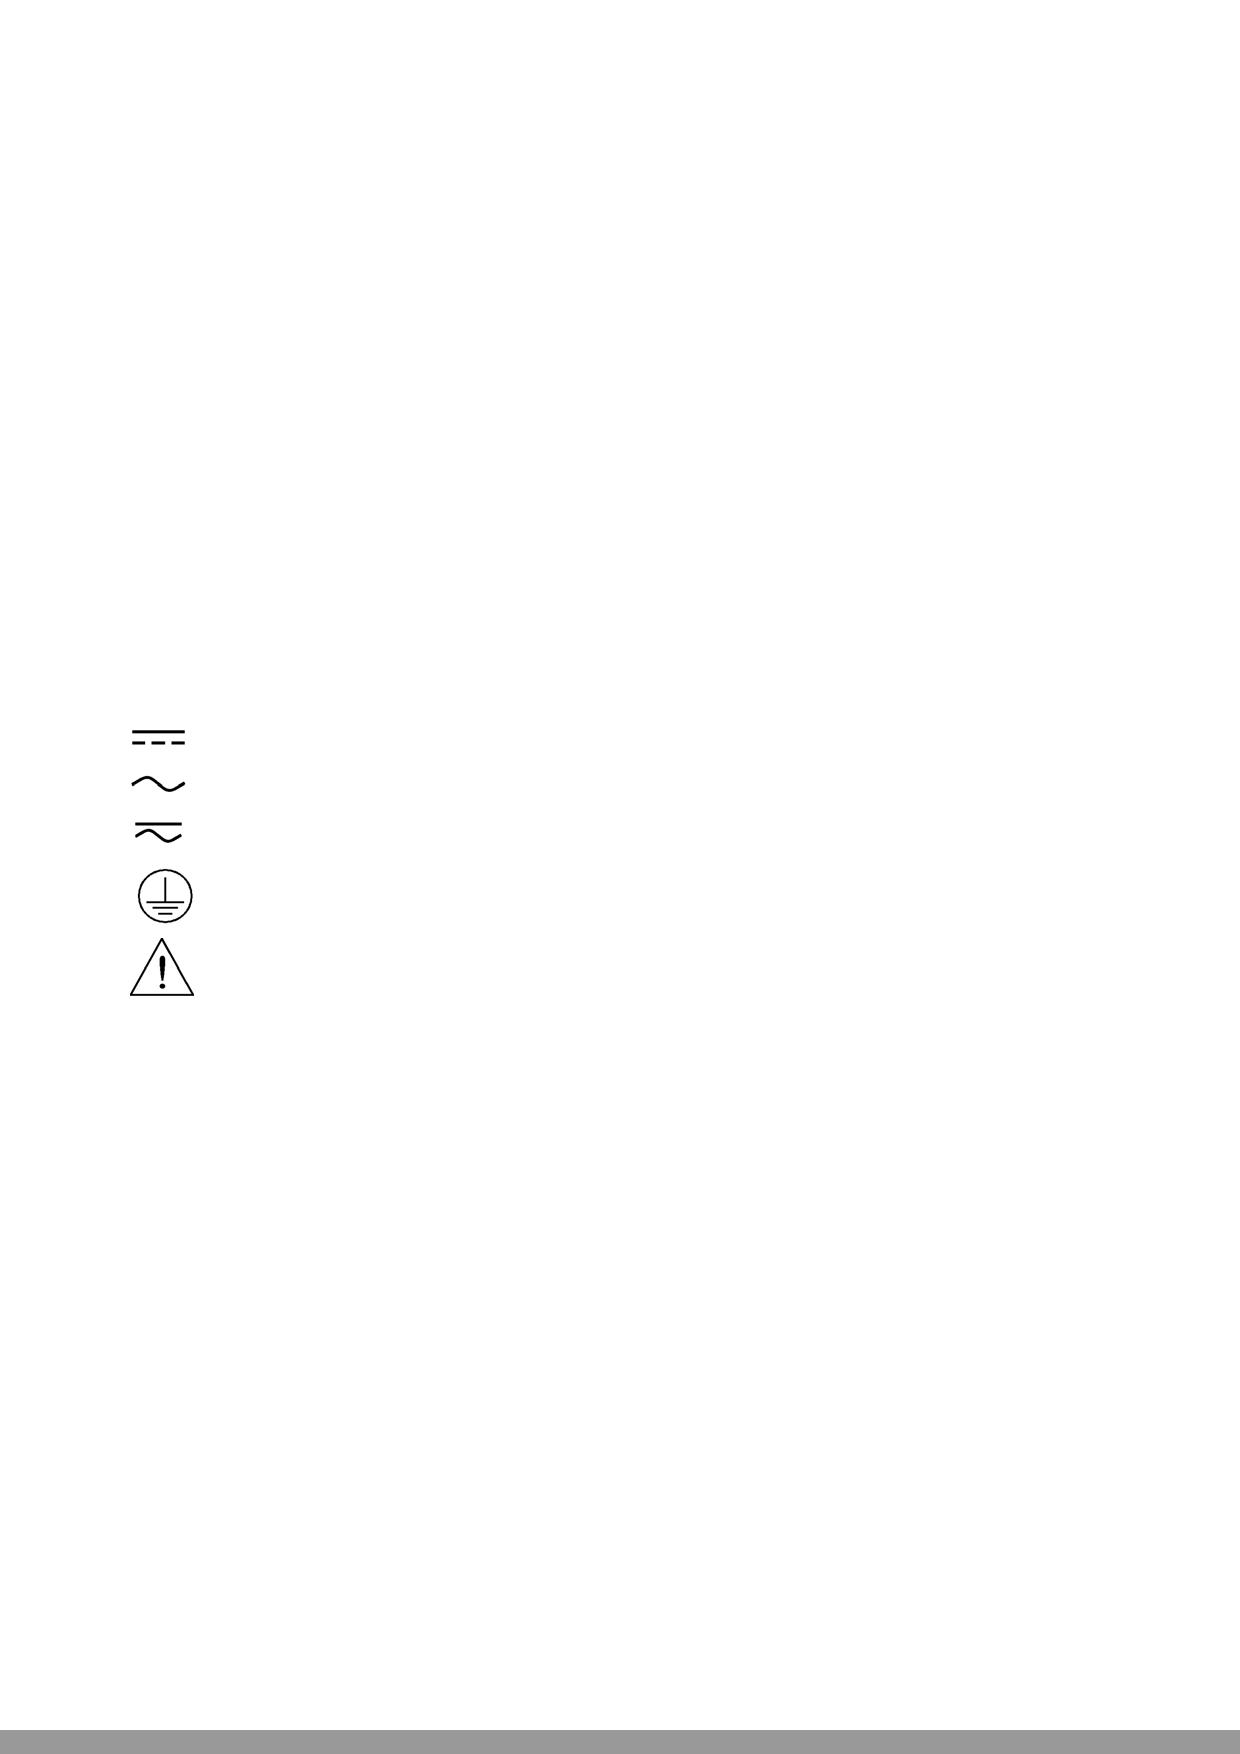 IT8518B pdf, 반도체, 판매, 대치품